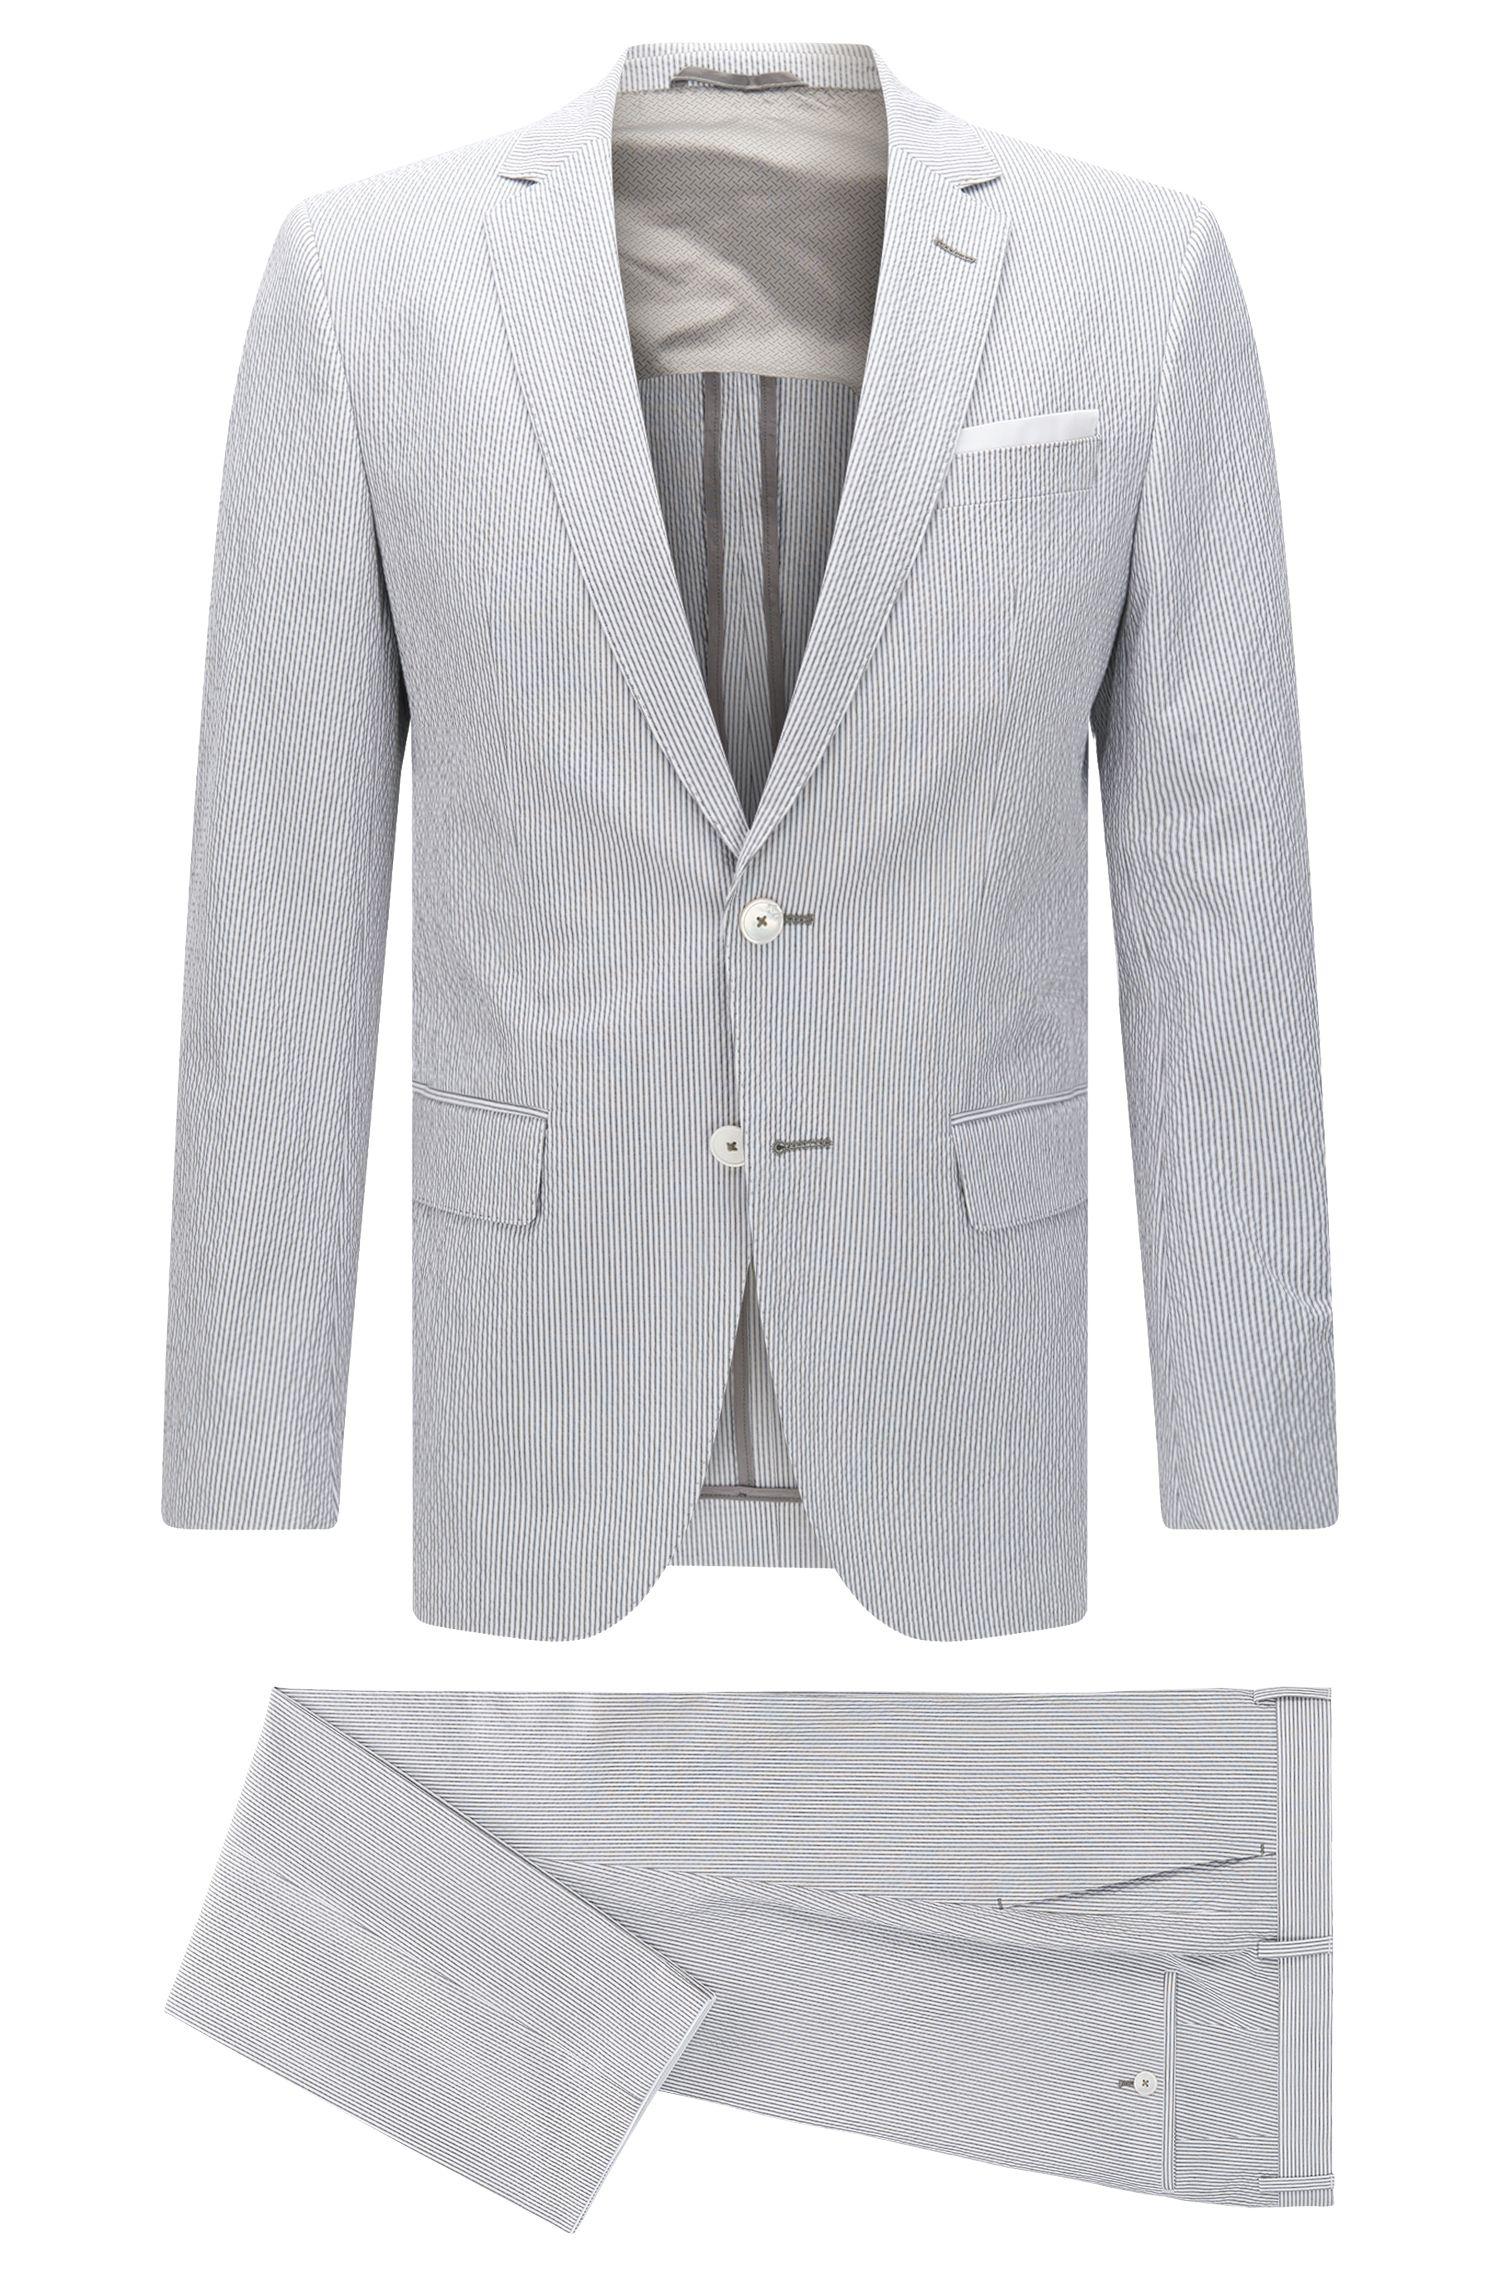 'Hedson/Gander' | Slim Fit, Seersucker Stretch Cotton Suit